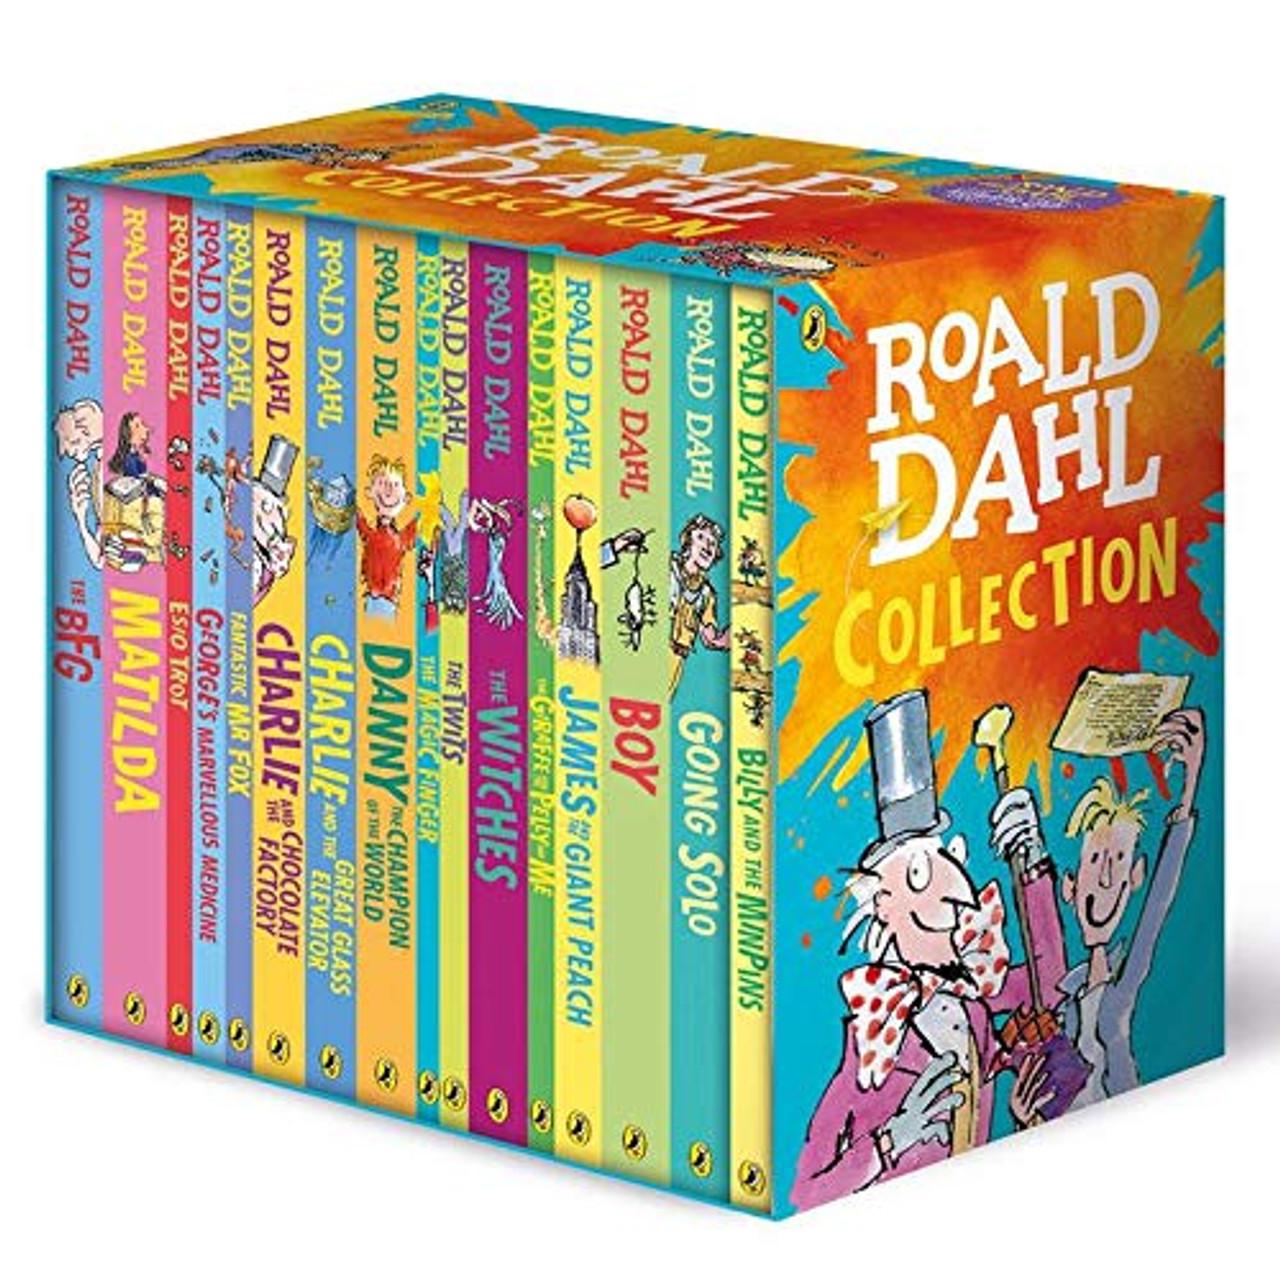 ROALD DAHL COLLECTION (16 BOOKS)